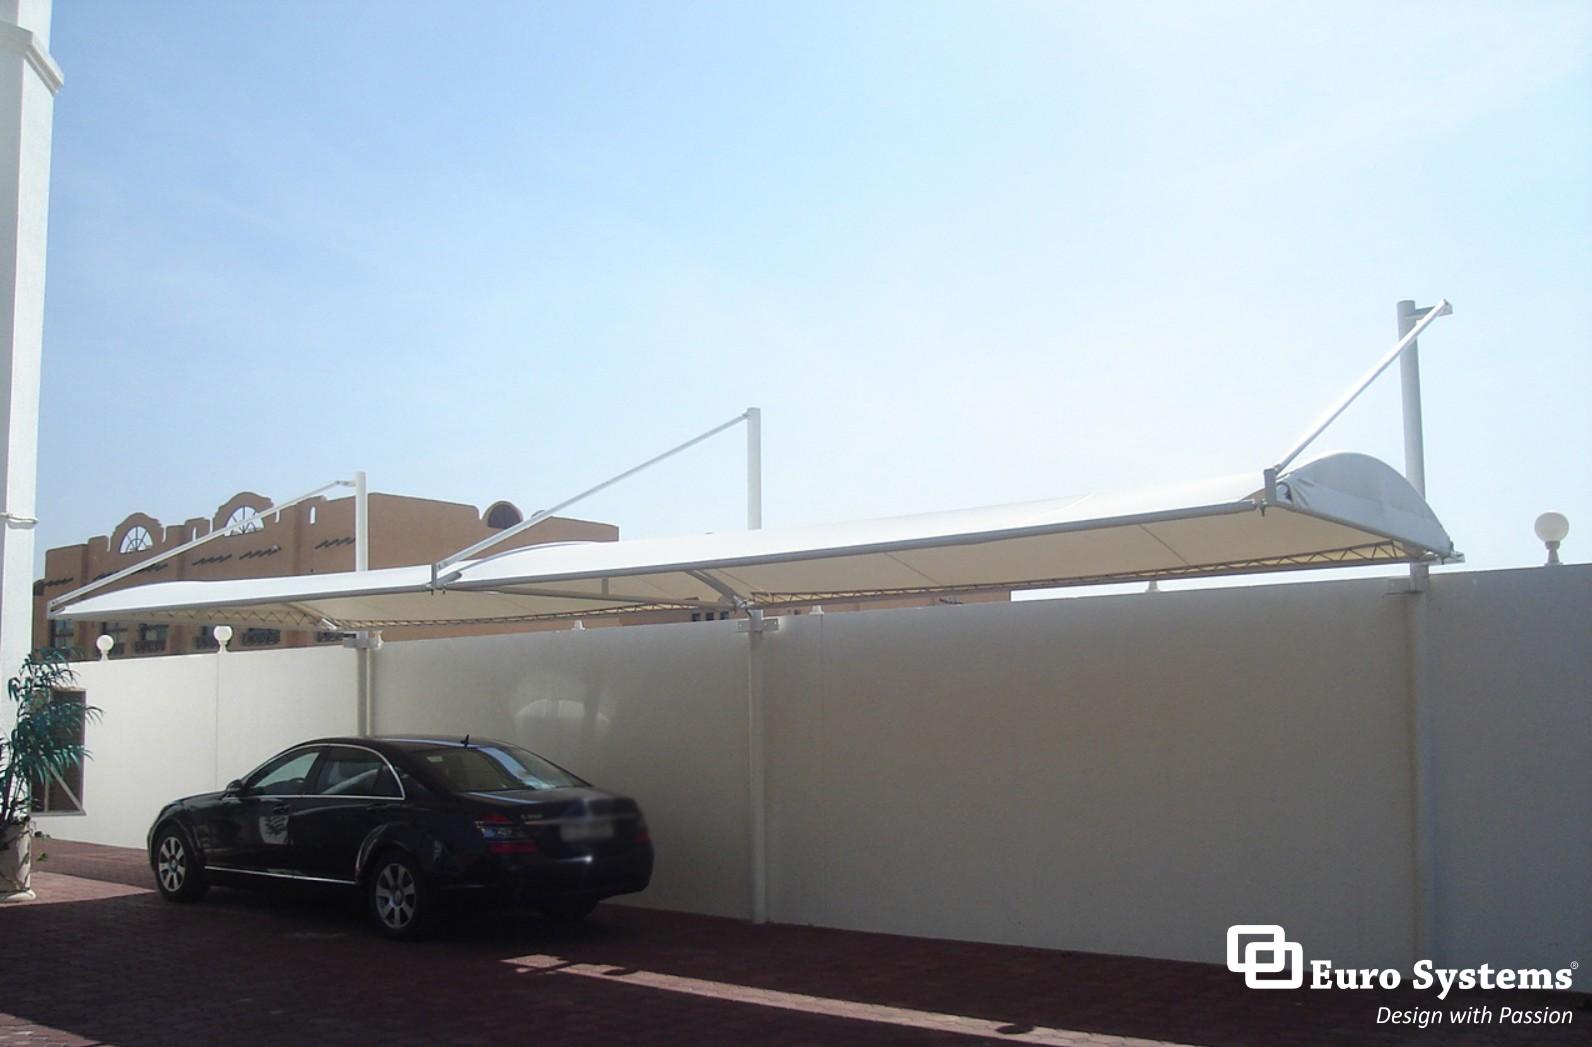 Carpark Shade, Client-Mirdif,  Dubai[1] (1)